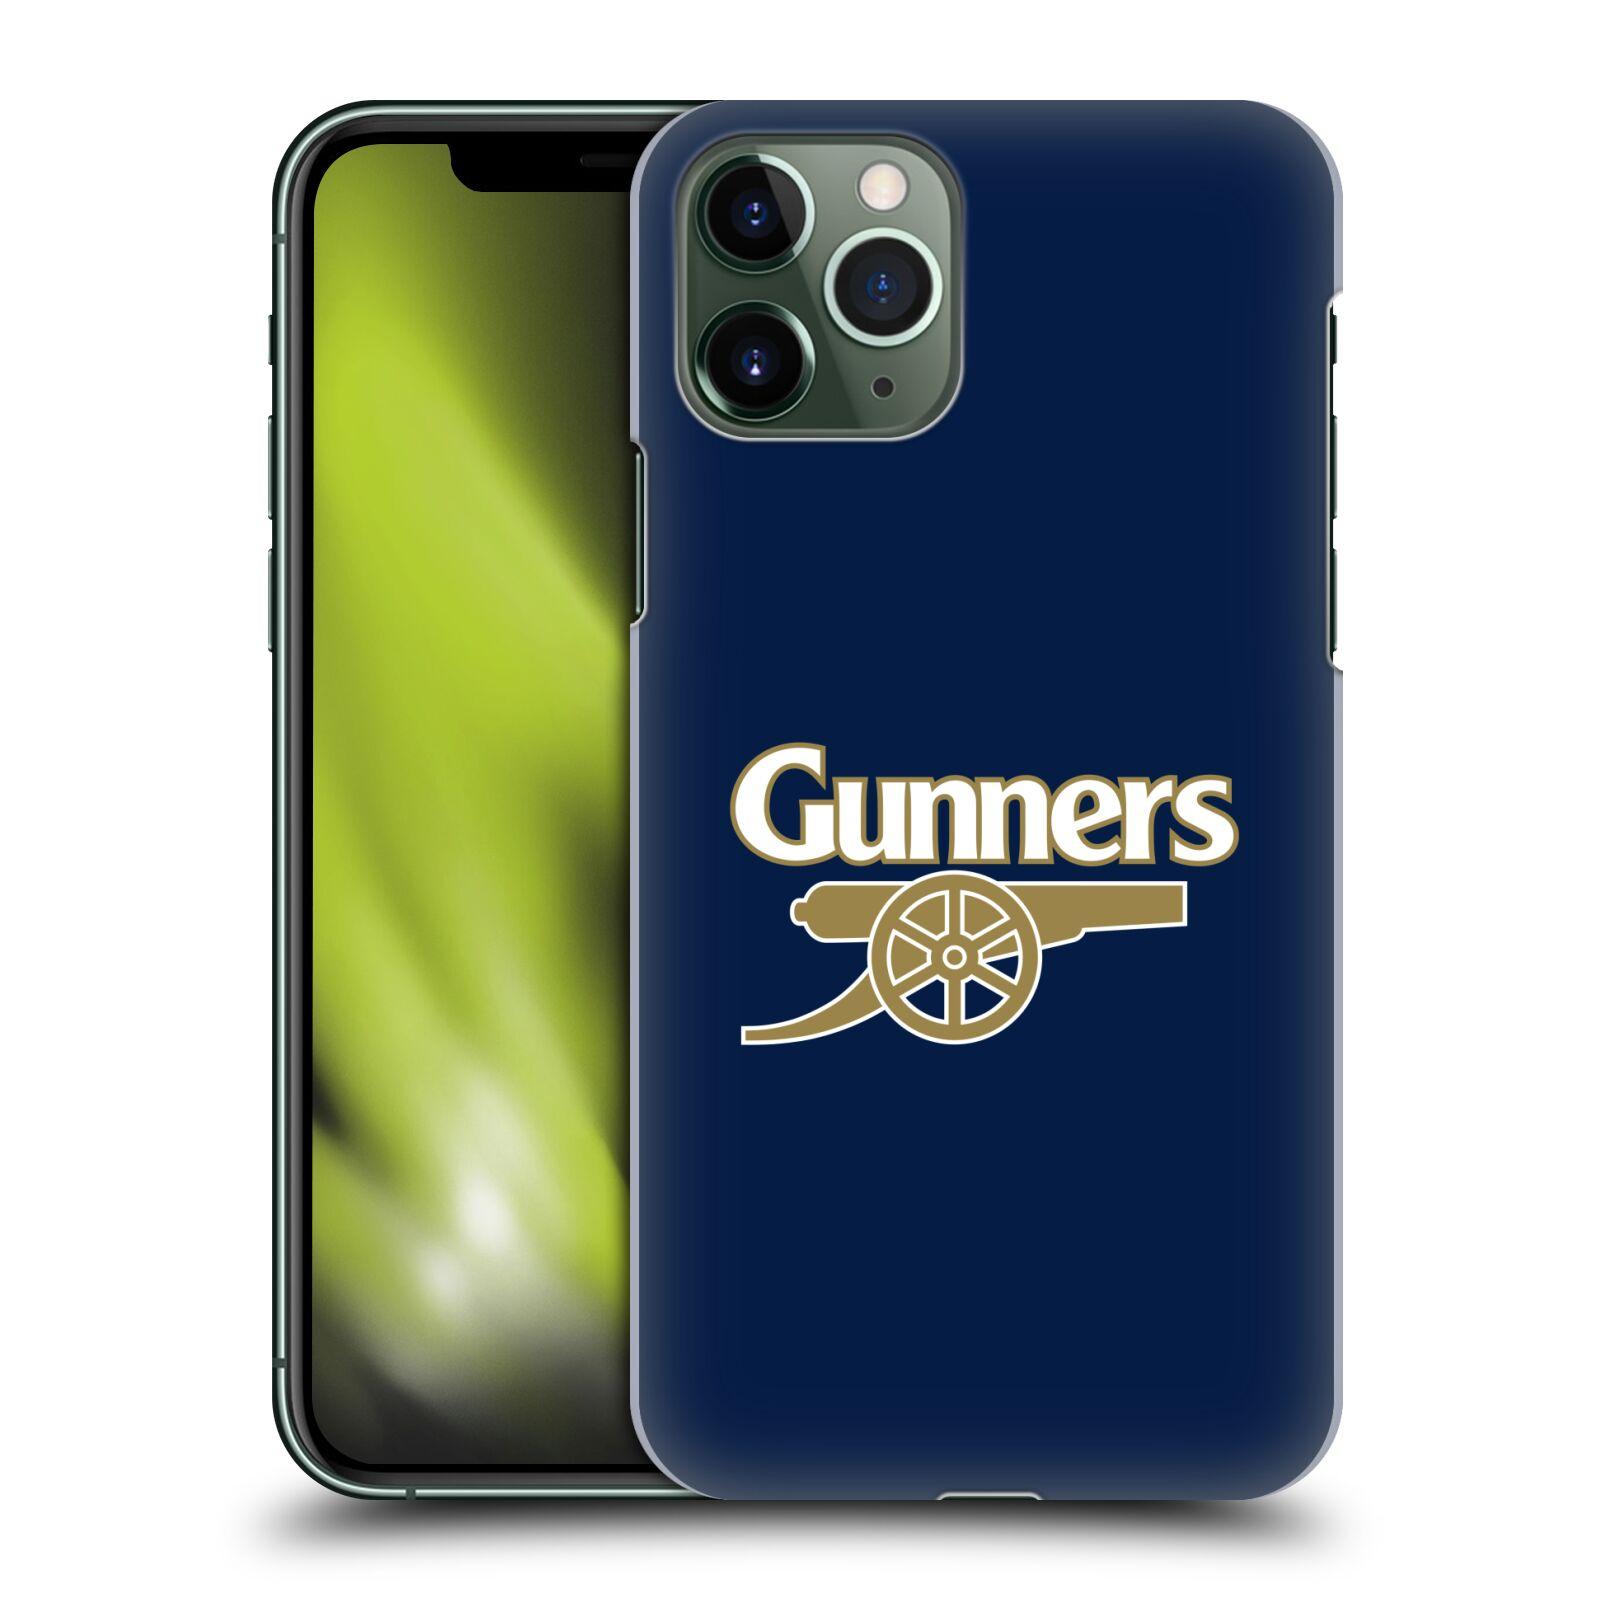 Plastové pouzdro na mobil Apple iPhone 11 Pro - Head Case - Arsenal FC - Gunners